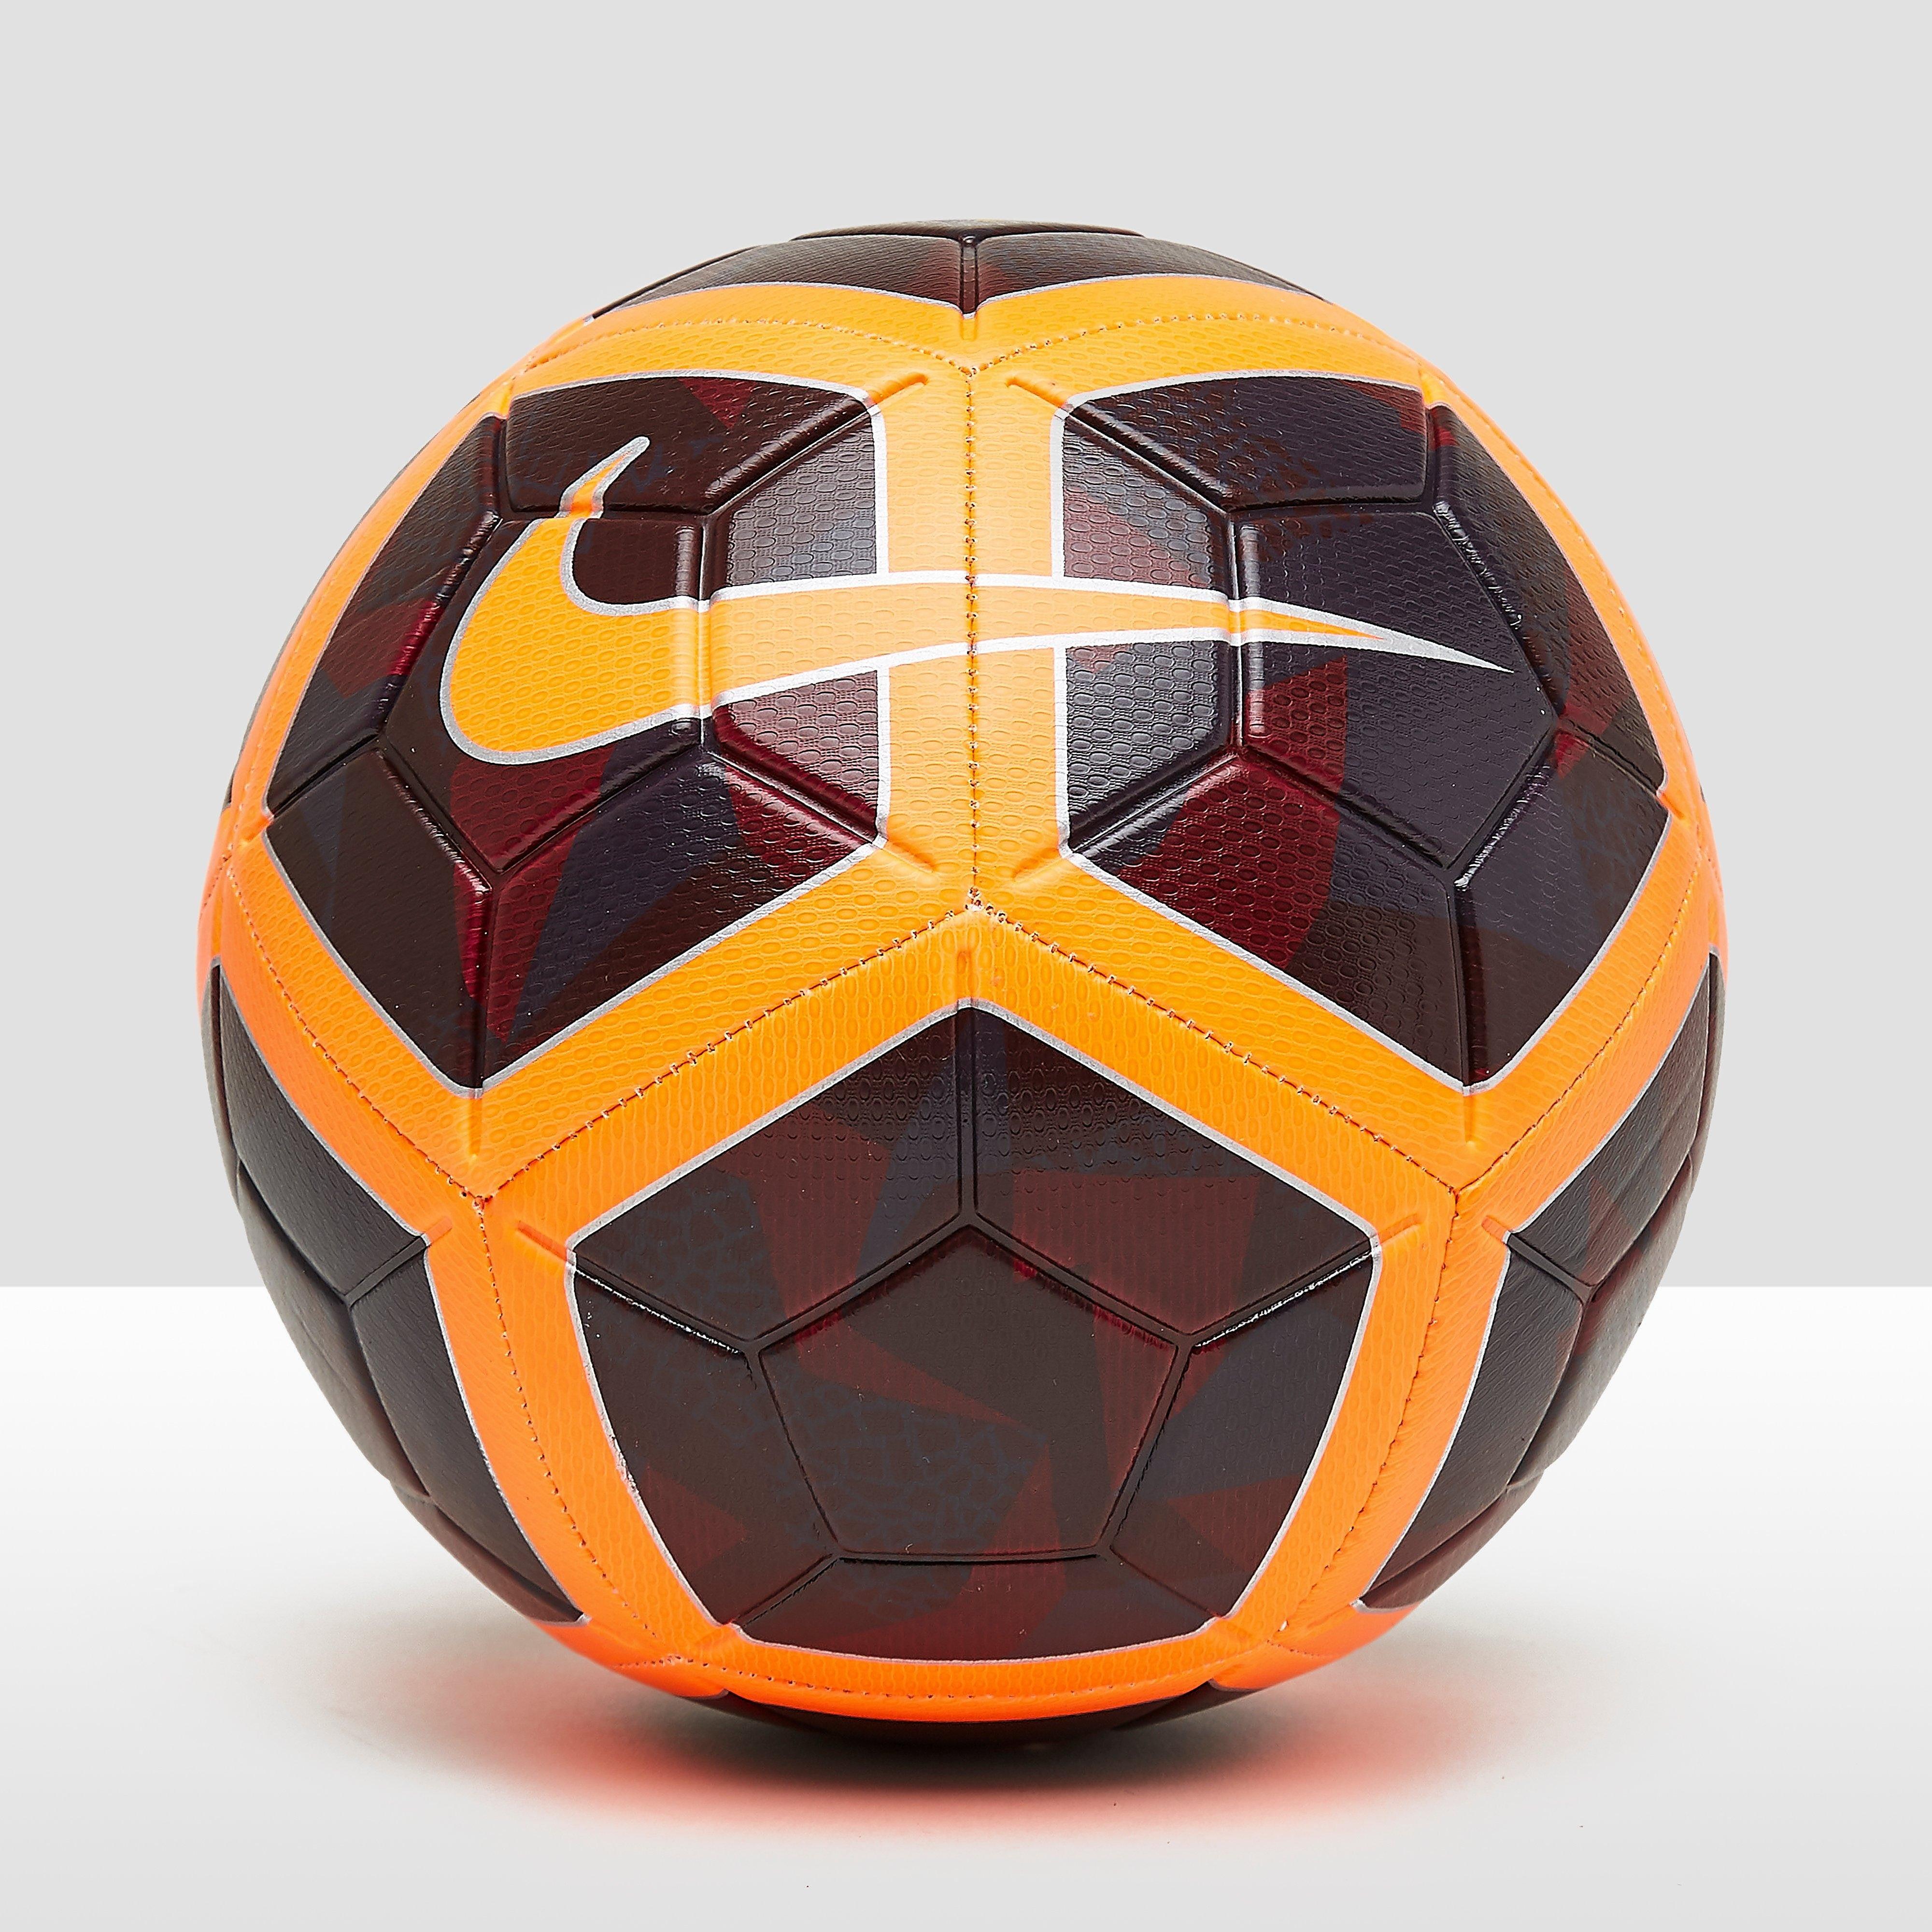 NIKE FC BARCELONA STRIKE VOETBAL 17/18 BORDEAUX ROOD